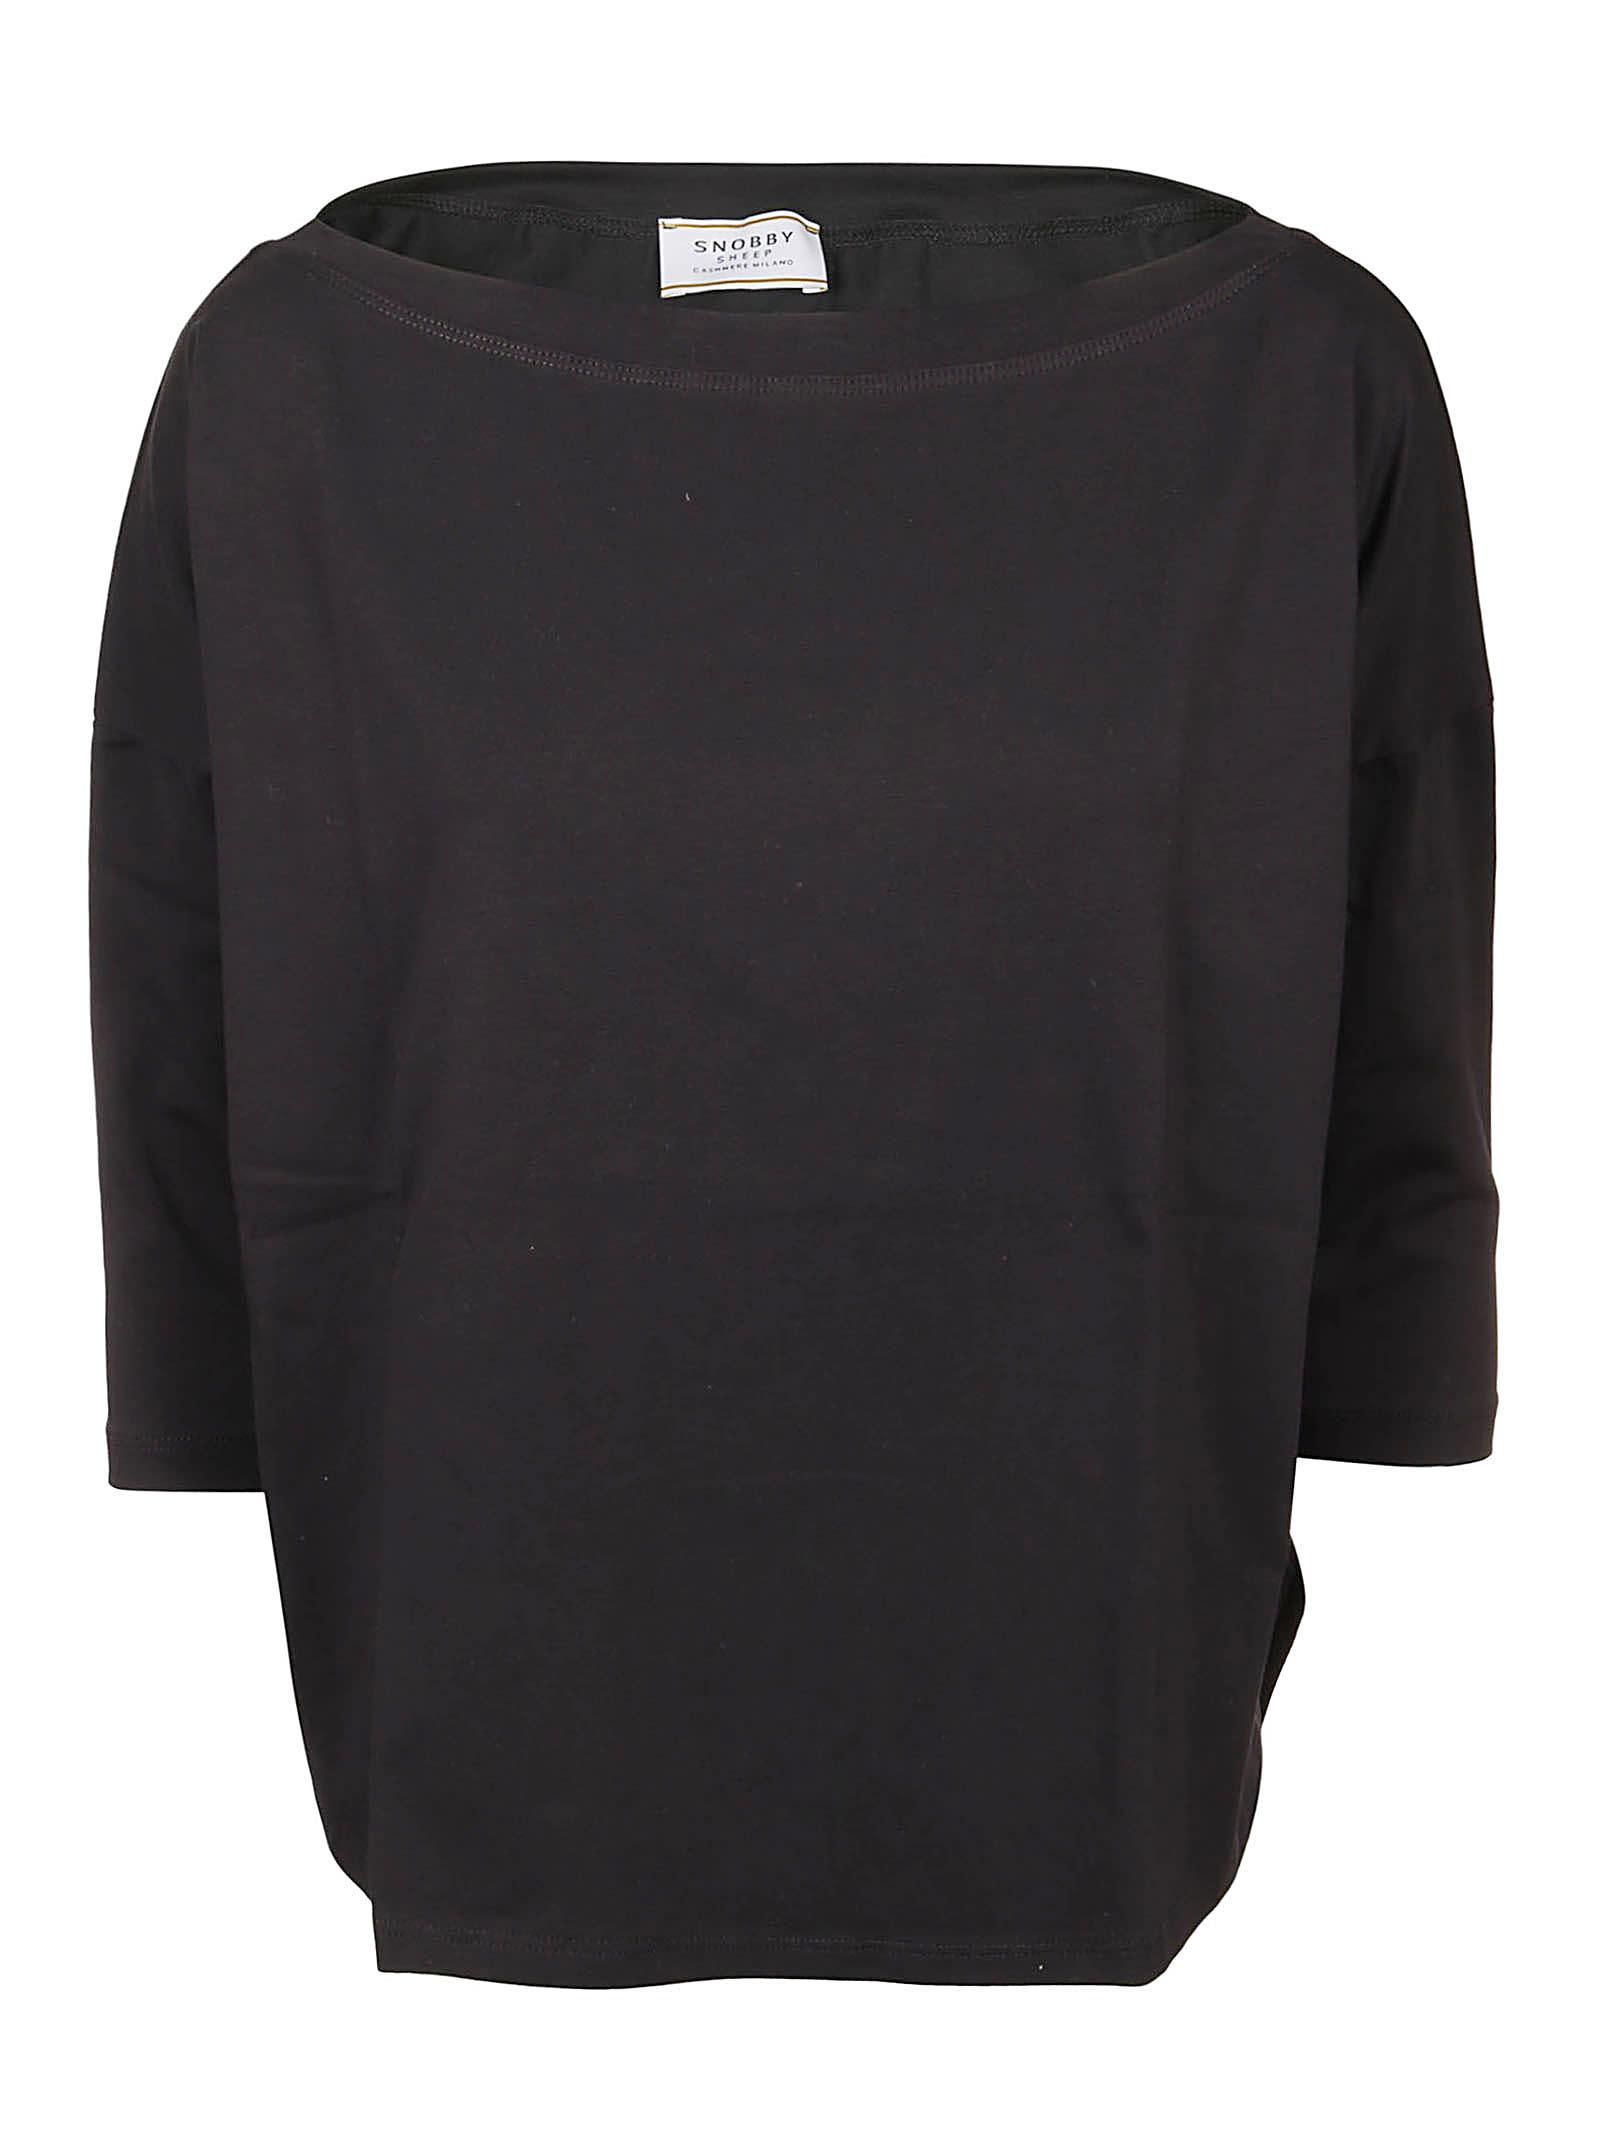 Snobby Sheep T-shirt 3/4 Sleeve